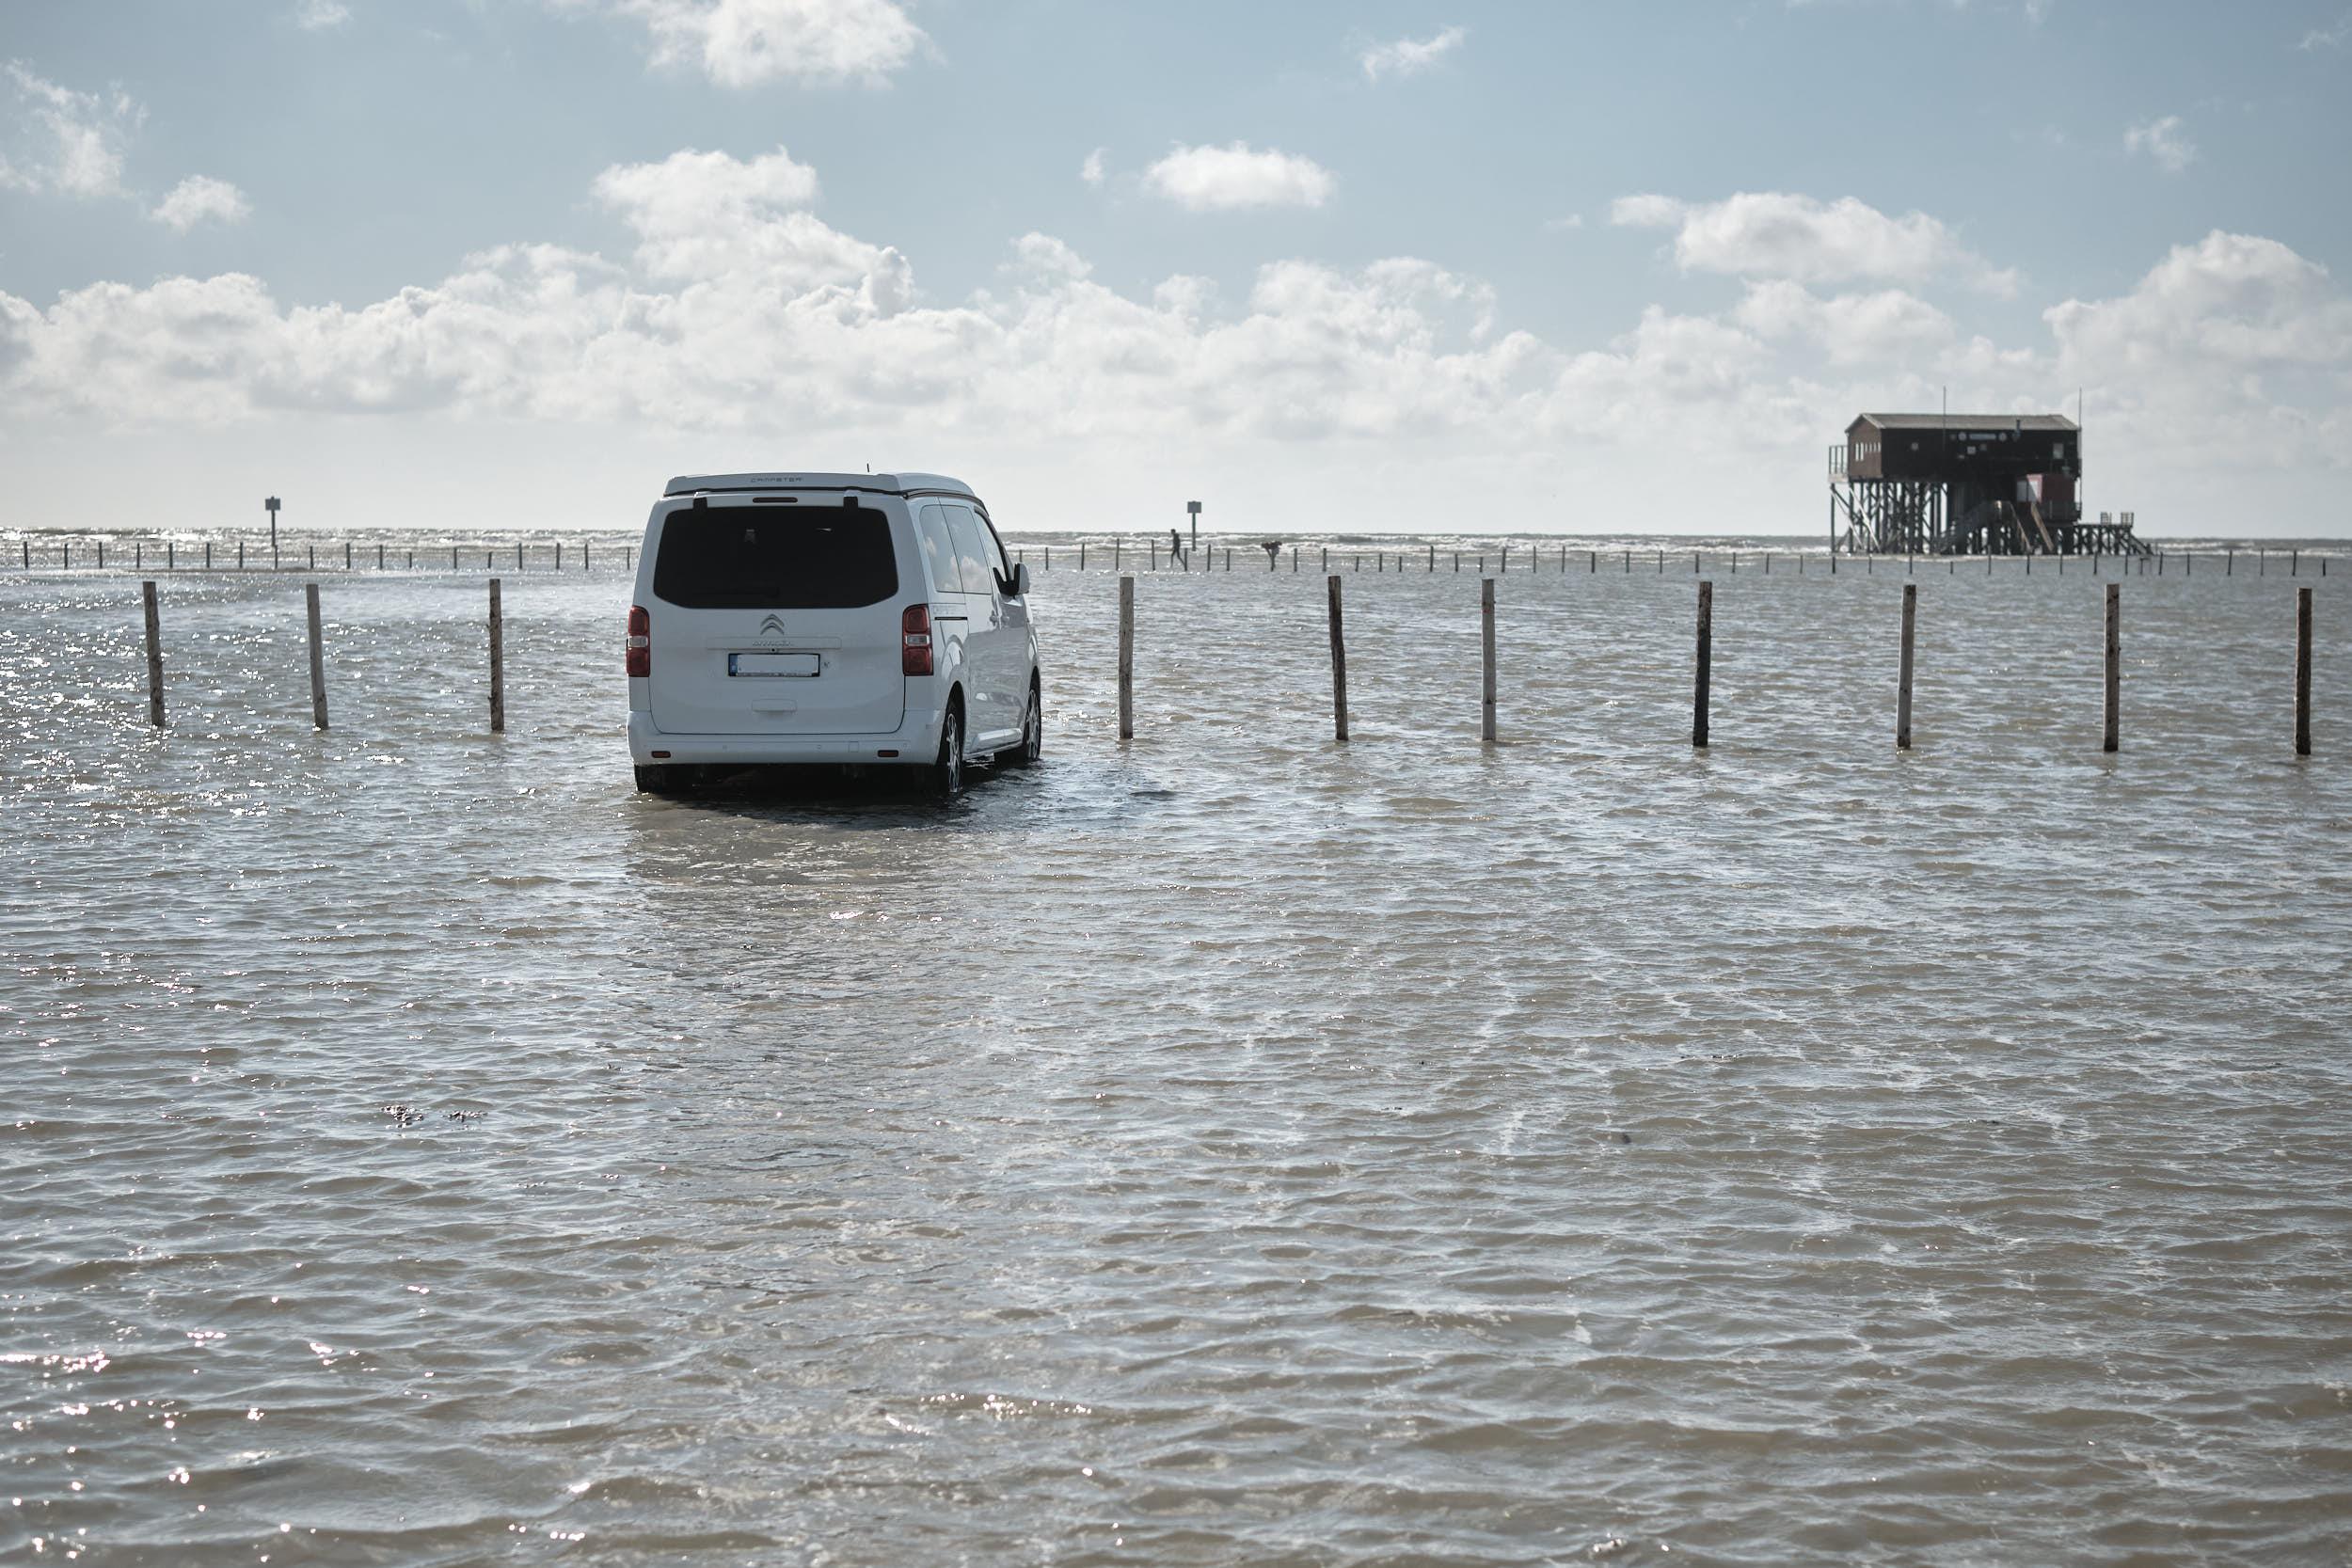 Strandparkplatz überflutet, Silbermöwe, Sankt-Peter-ording